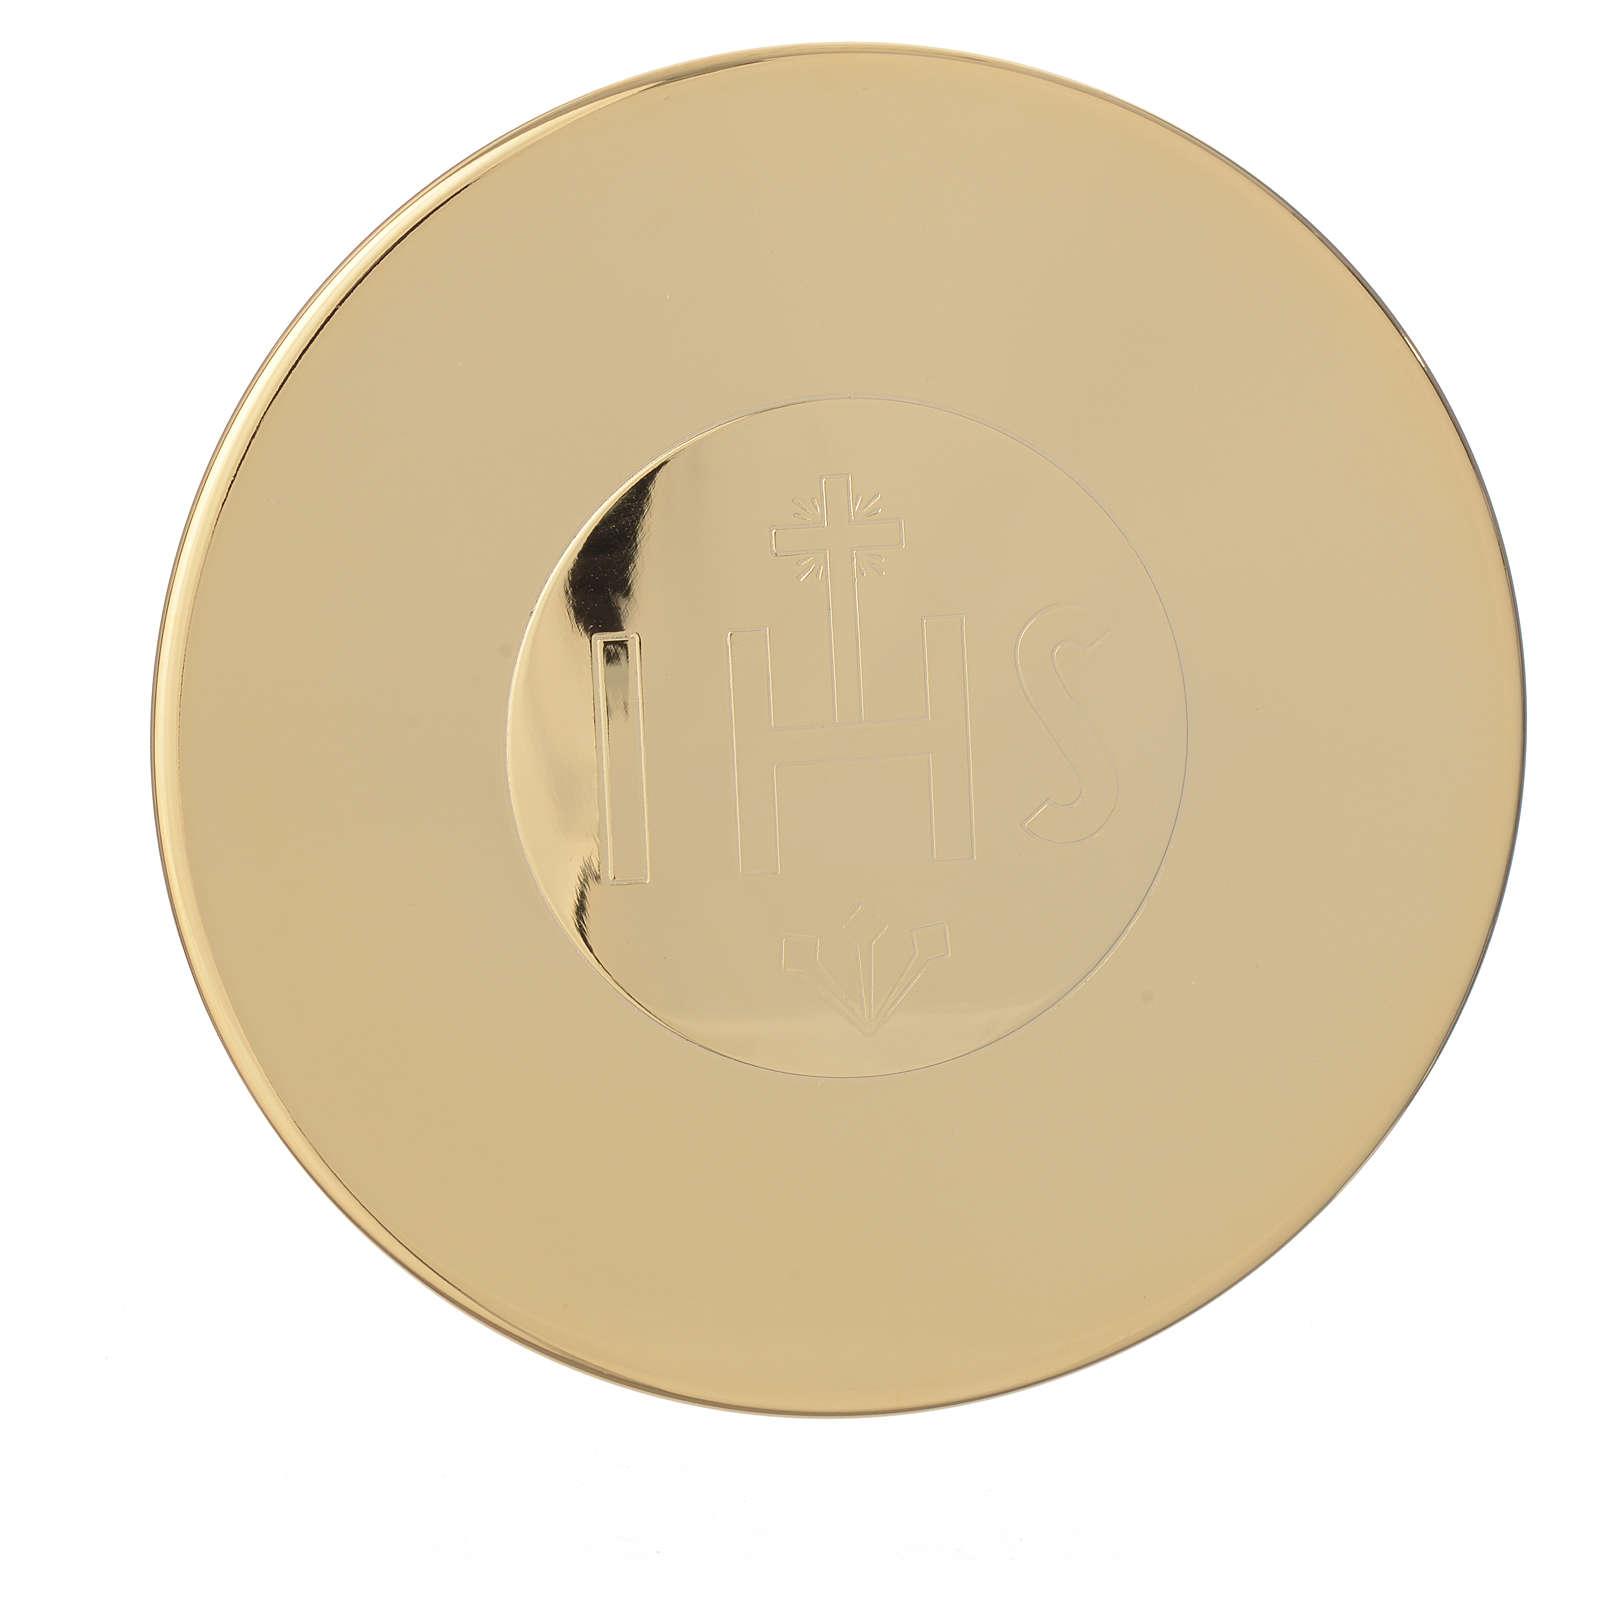 Golden brass pyx with IHS engraving, 9cm diameter 3